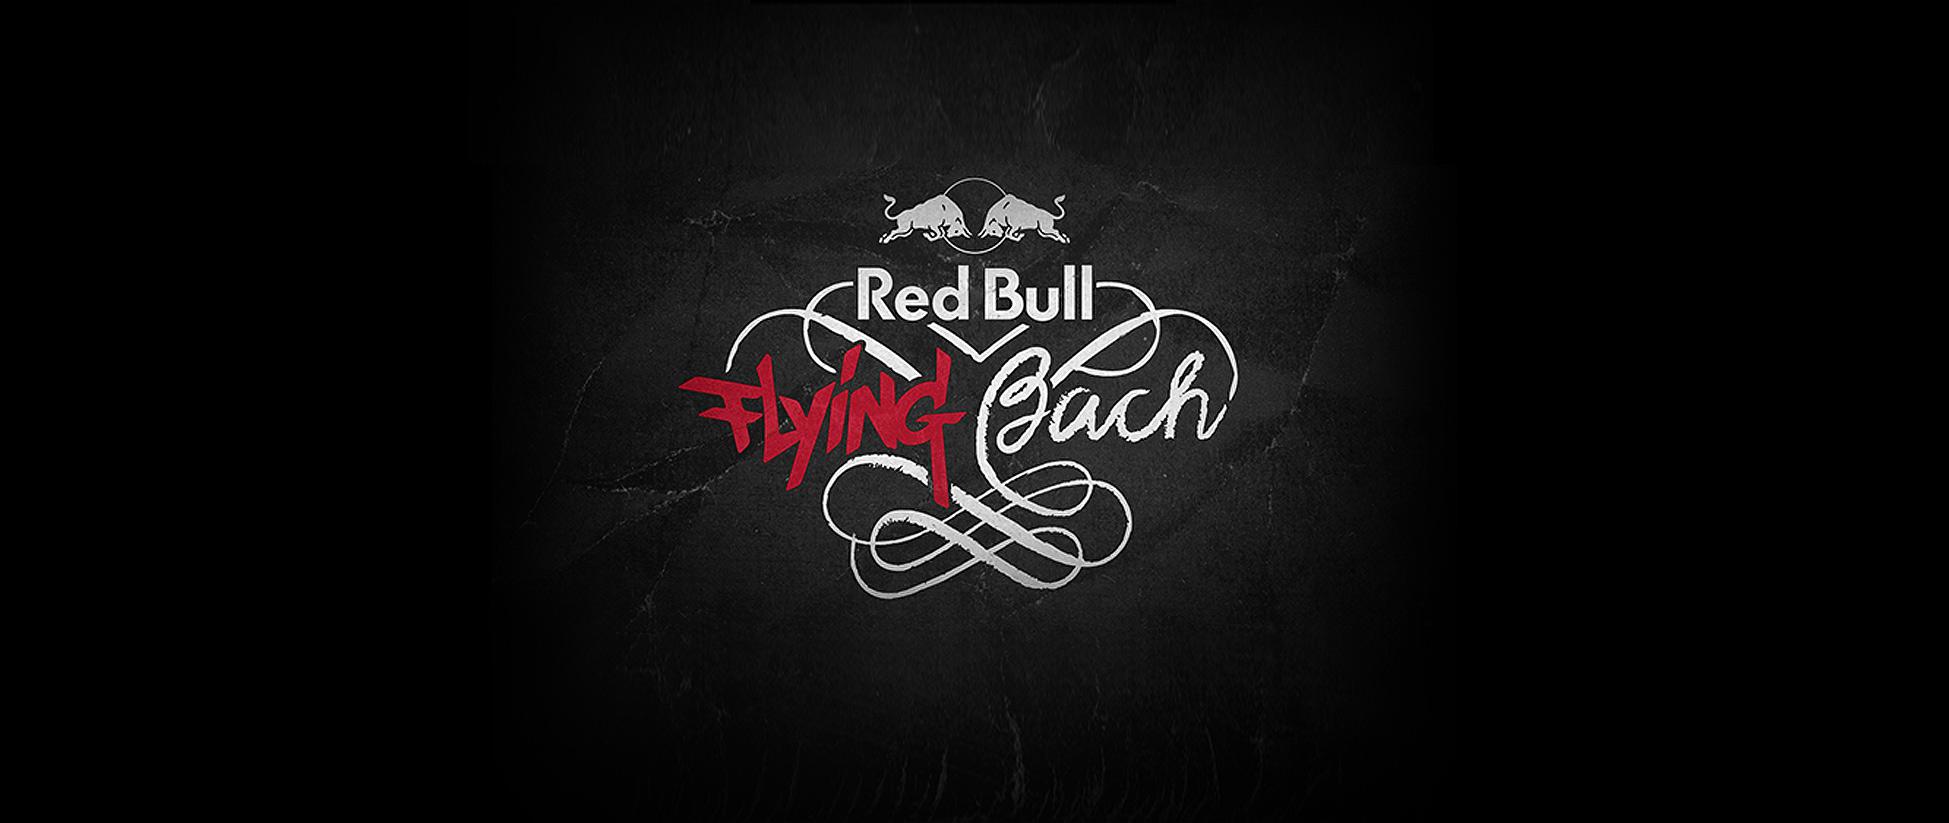 RedBullFlyingBach_logo